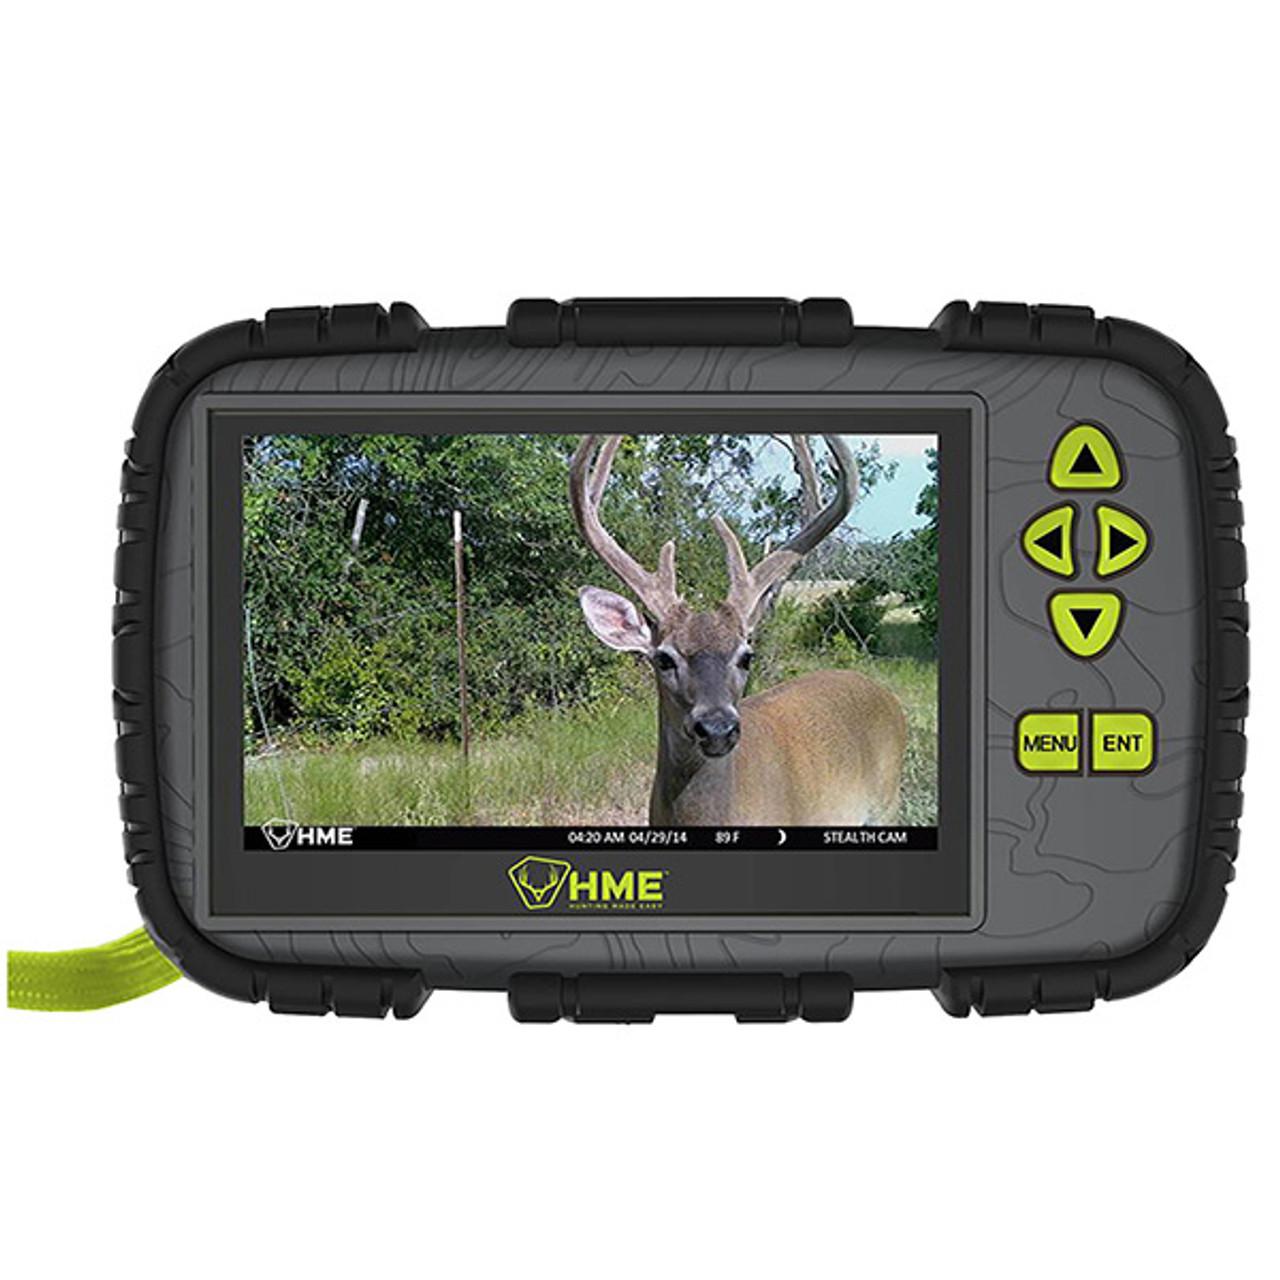 "HME SD Card Reader 4.3"" LCD Screen"